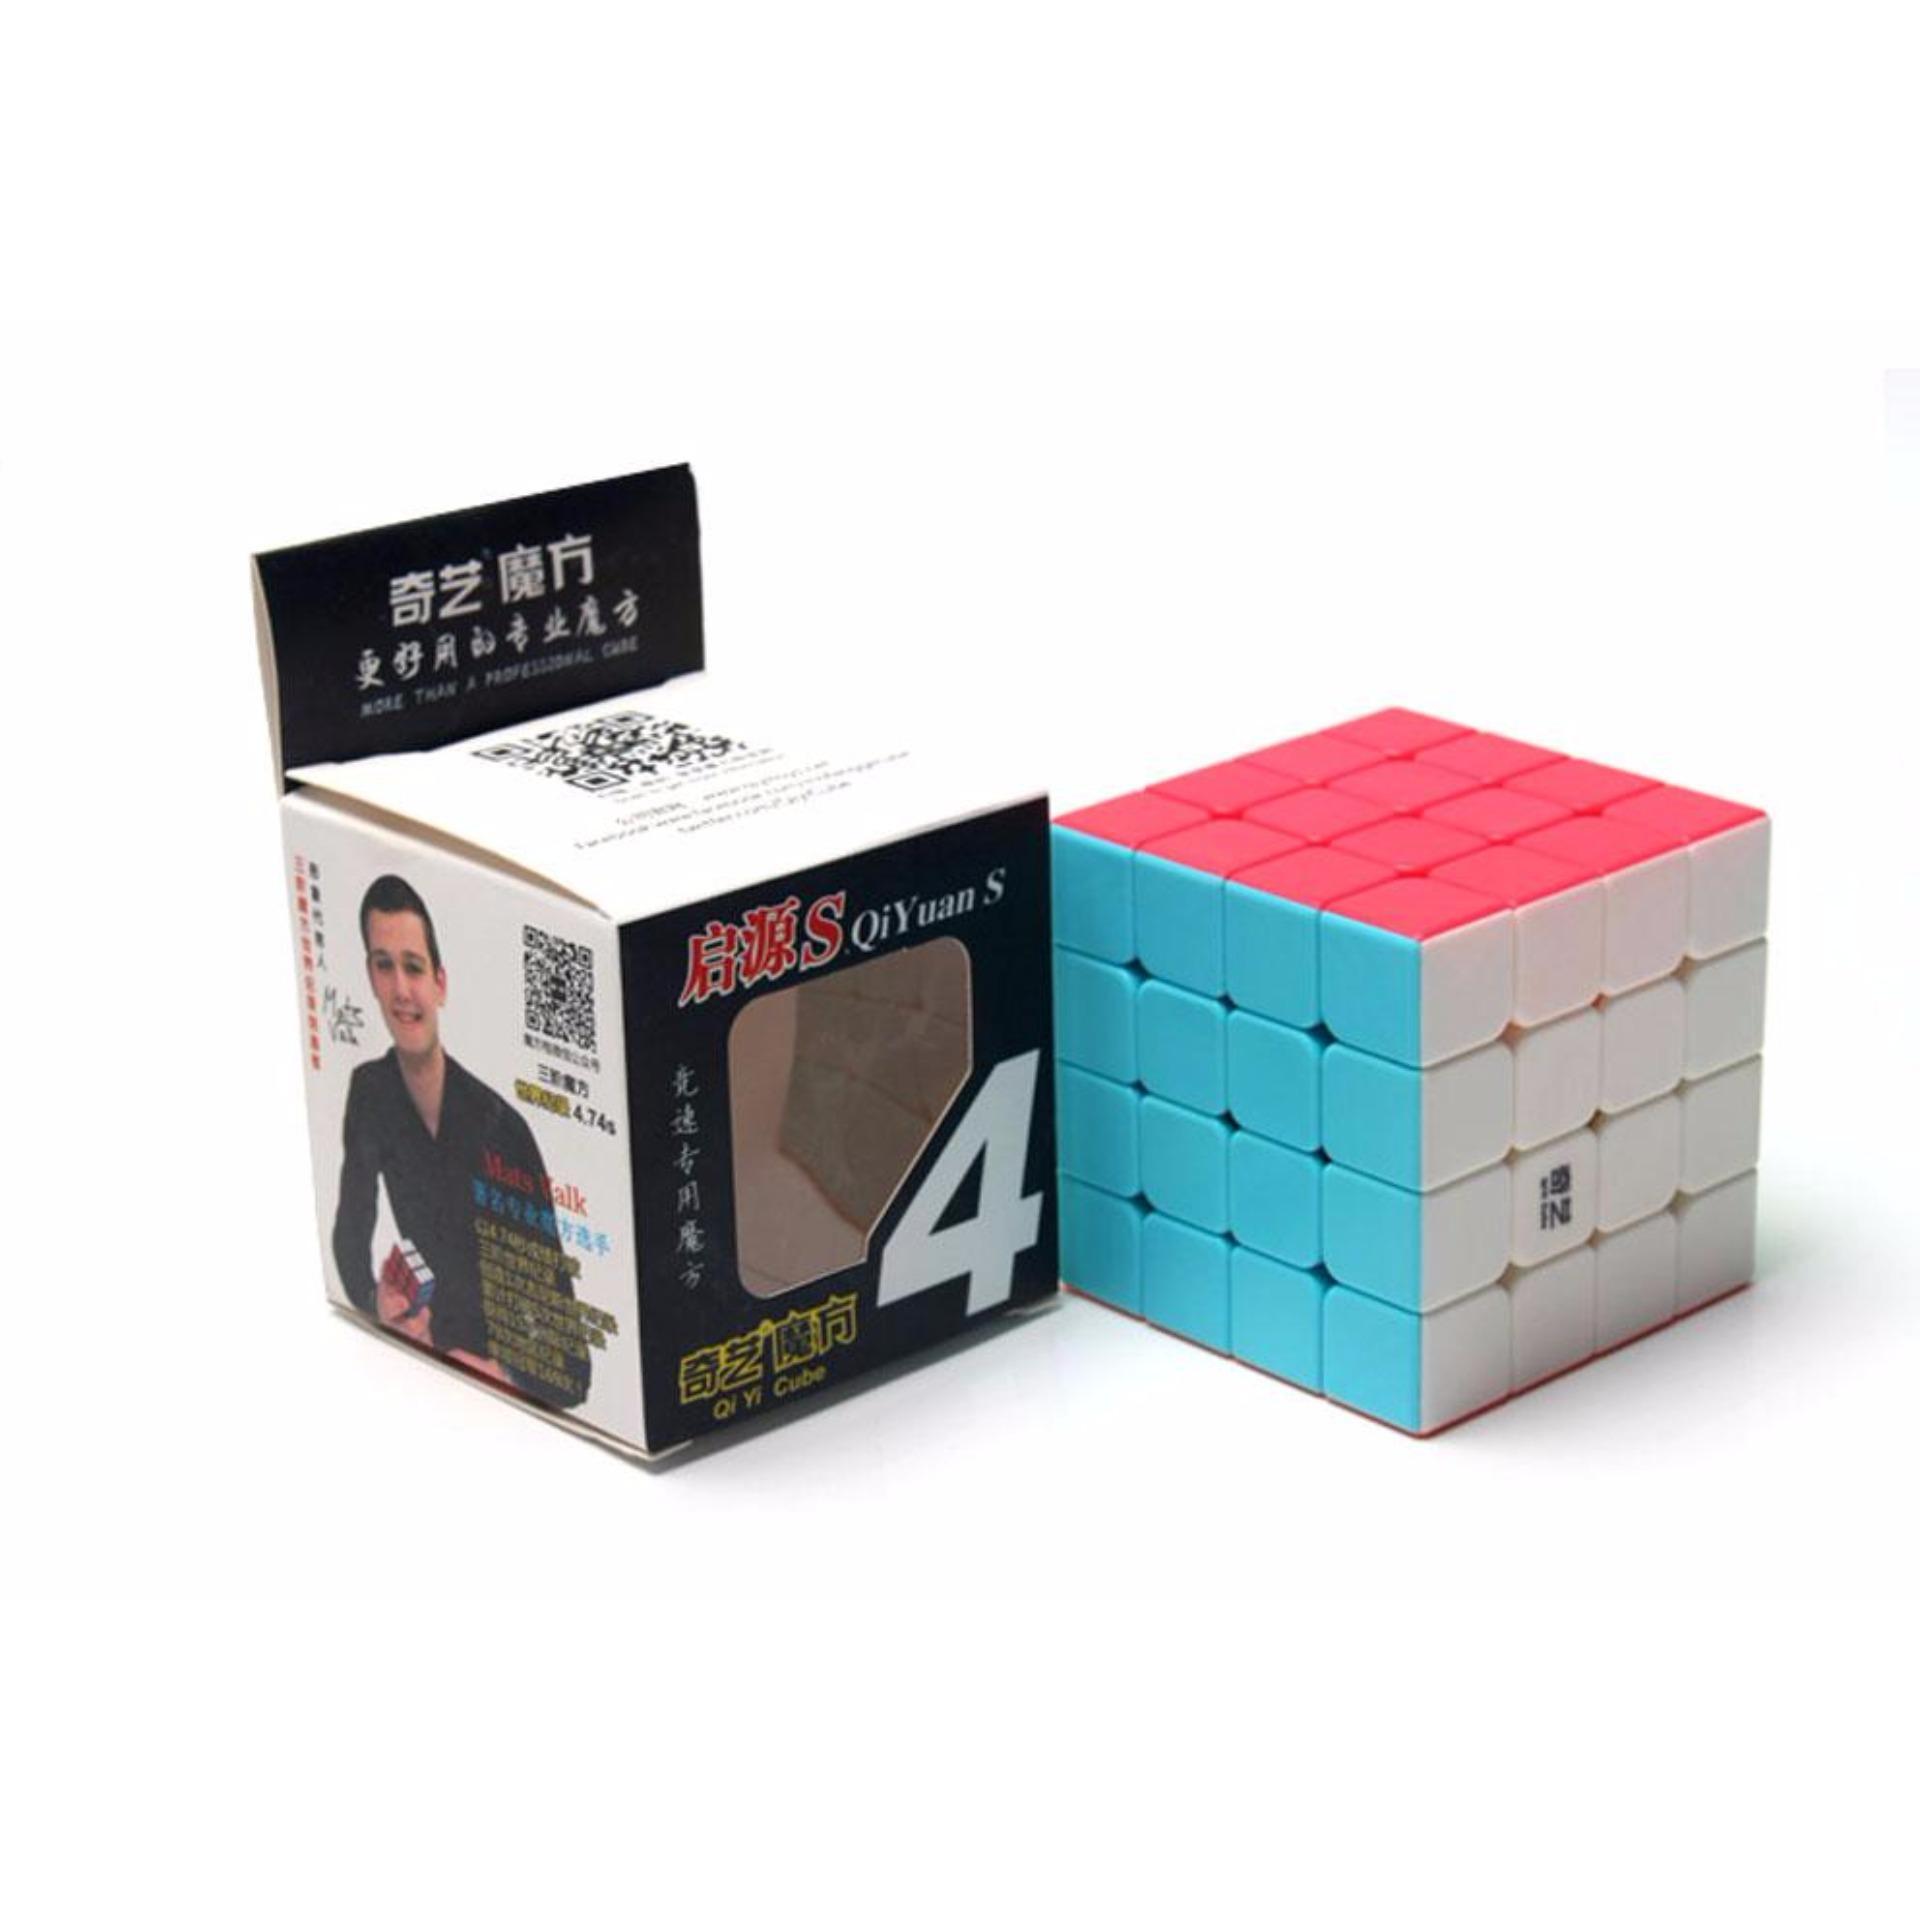 Qiyi Qiyuan S 4X4X4 Stickerless